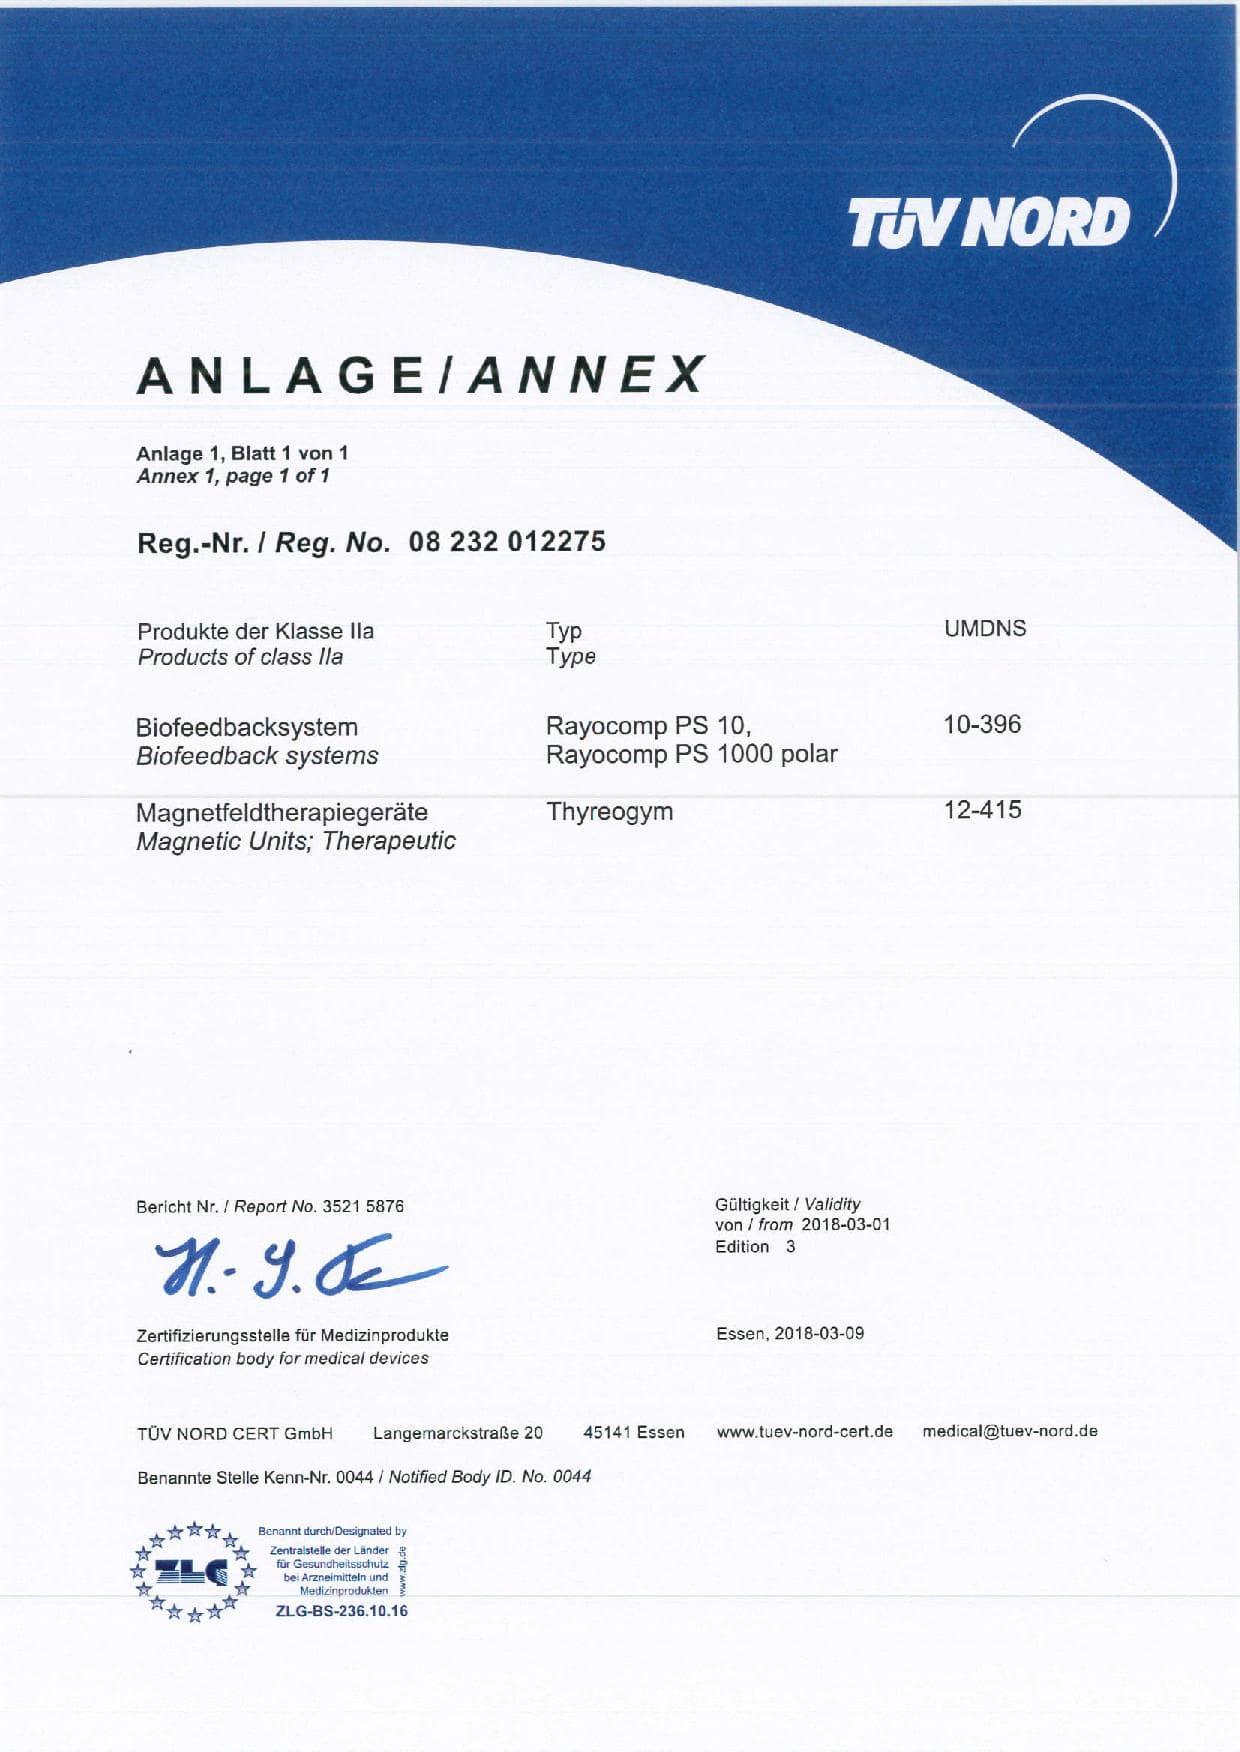 Rayonex Biomedical Anhang II.3 Anlage ed. 3 de-en